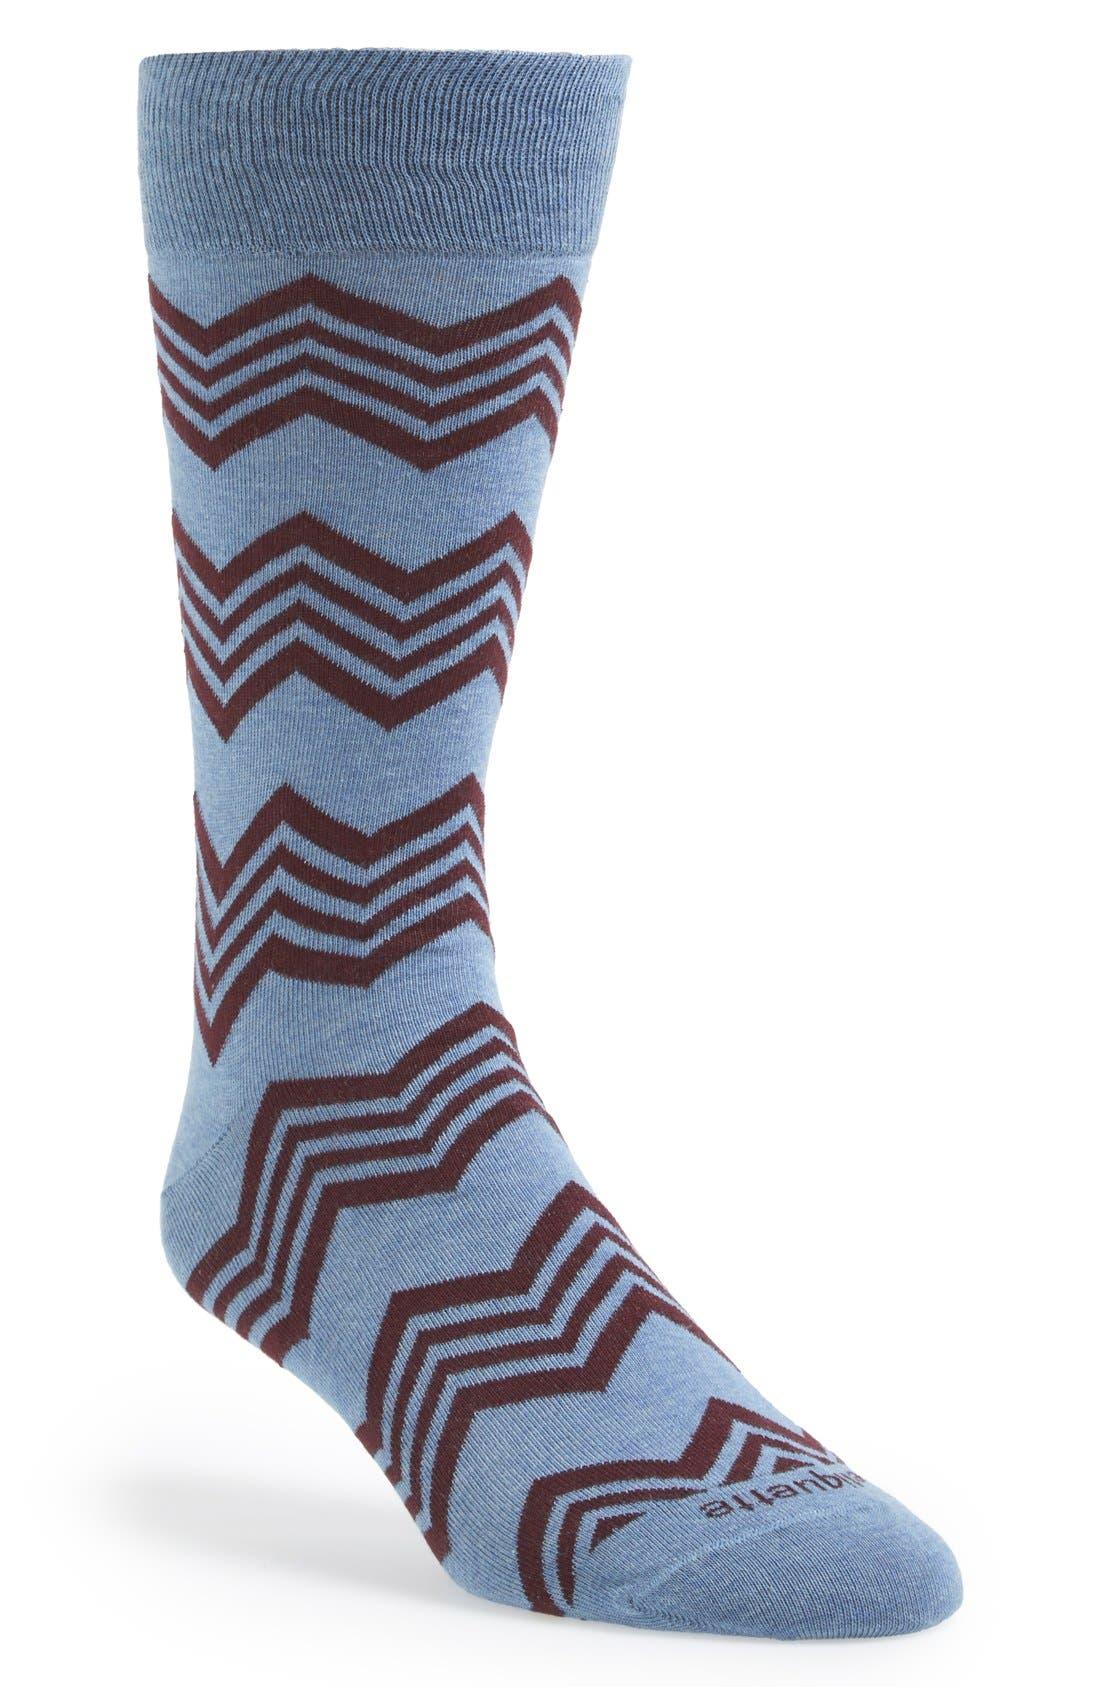 Alternate Image 1 Selected - Etiquette Clothiers 'Alpine' Stripe Socks